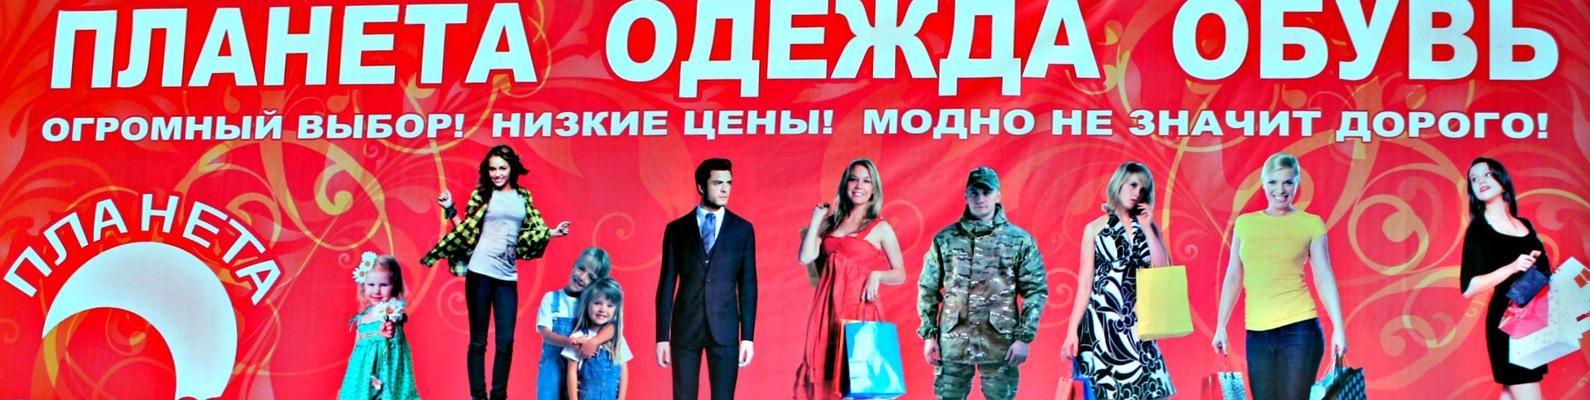 f02dc19a1 ПЛАНЕТА ОДЕЖДА ОБУВЬ - магазин низких цен! | ВКонтакте